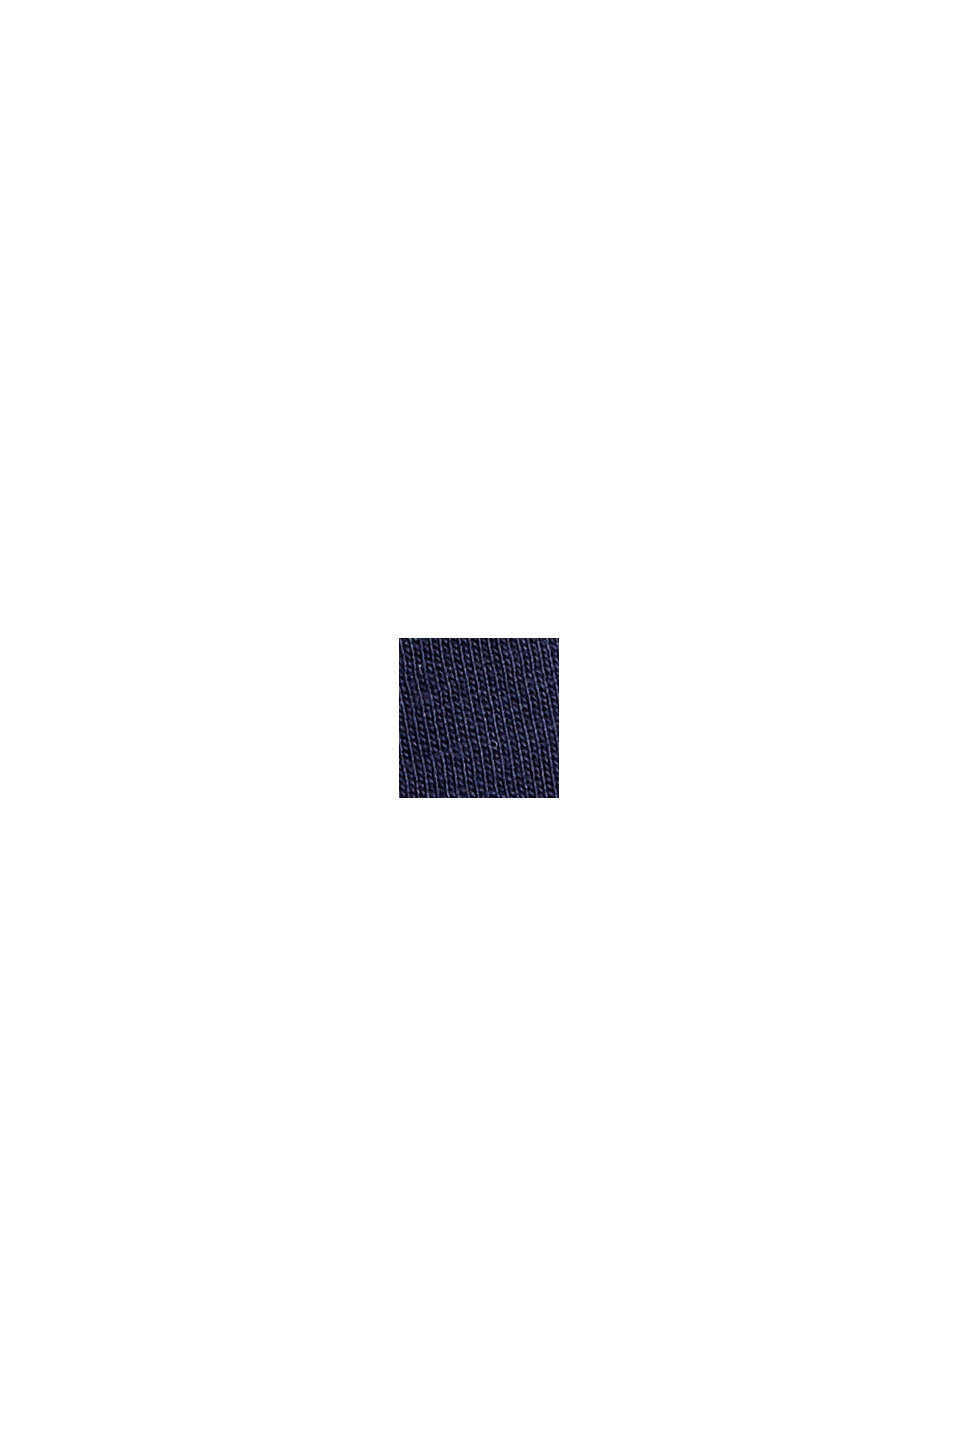 Boxy Logo-Shirt aus 100% Bio-Baumwolle, NAVY, swatch